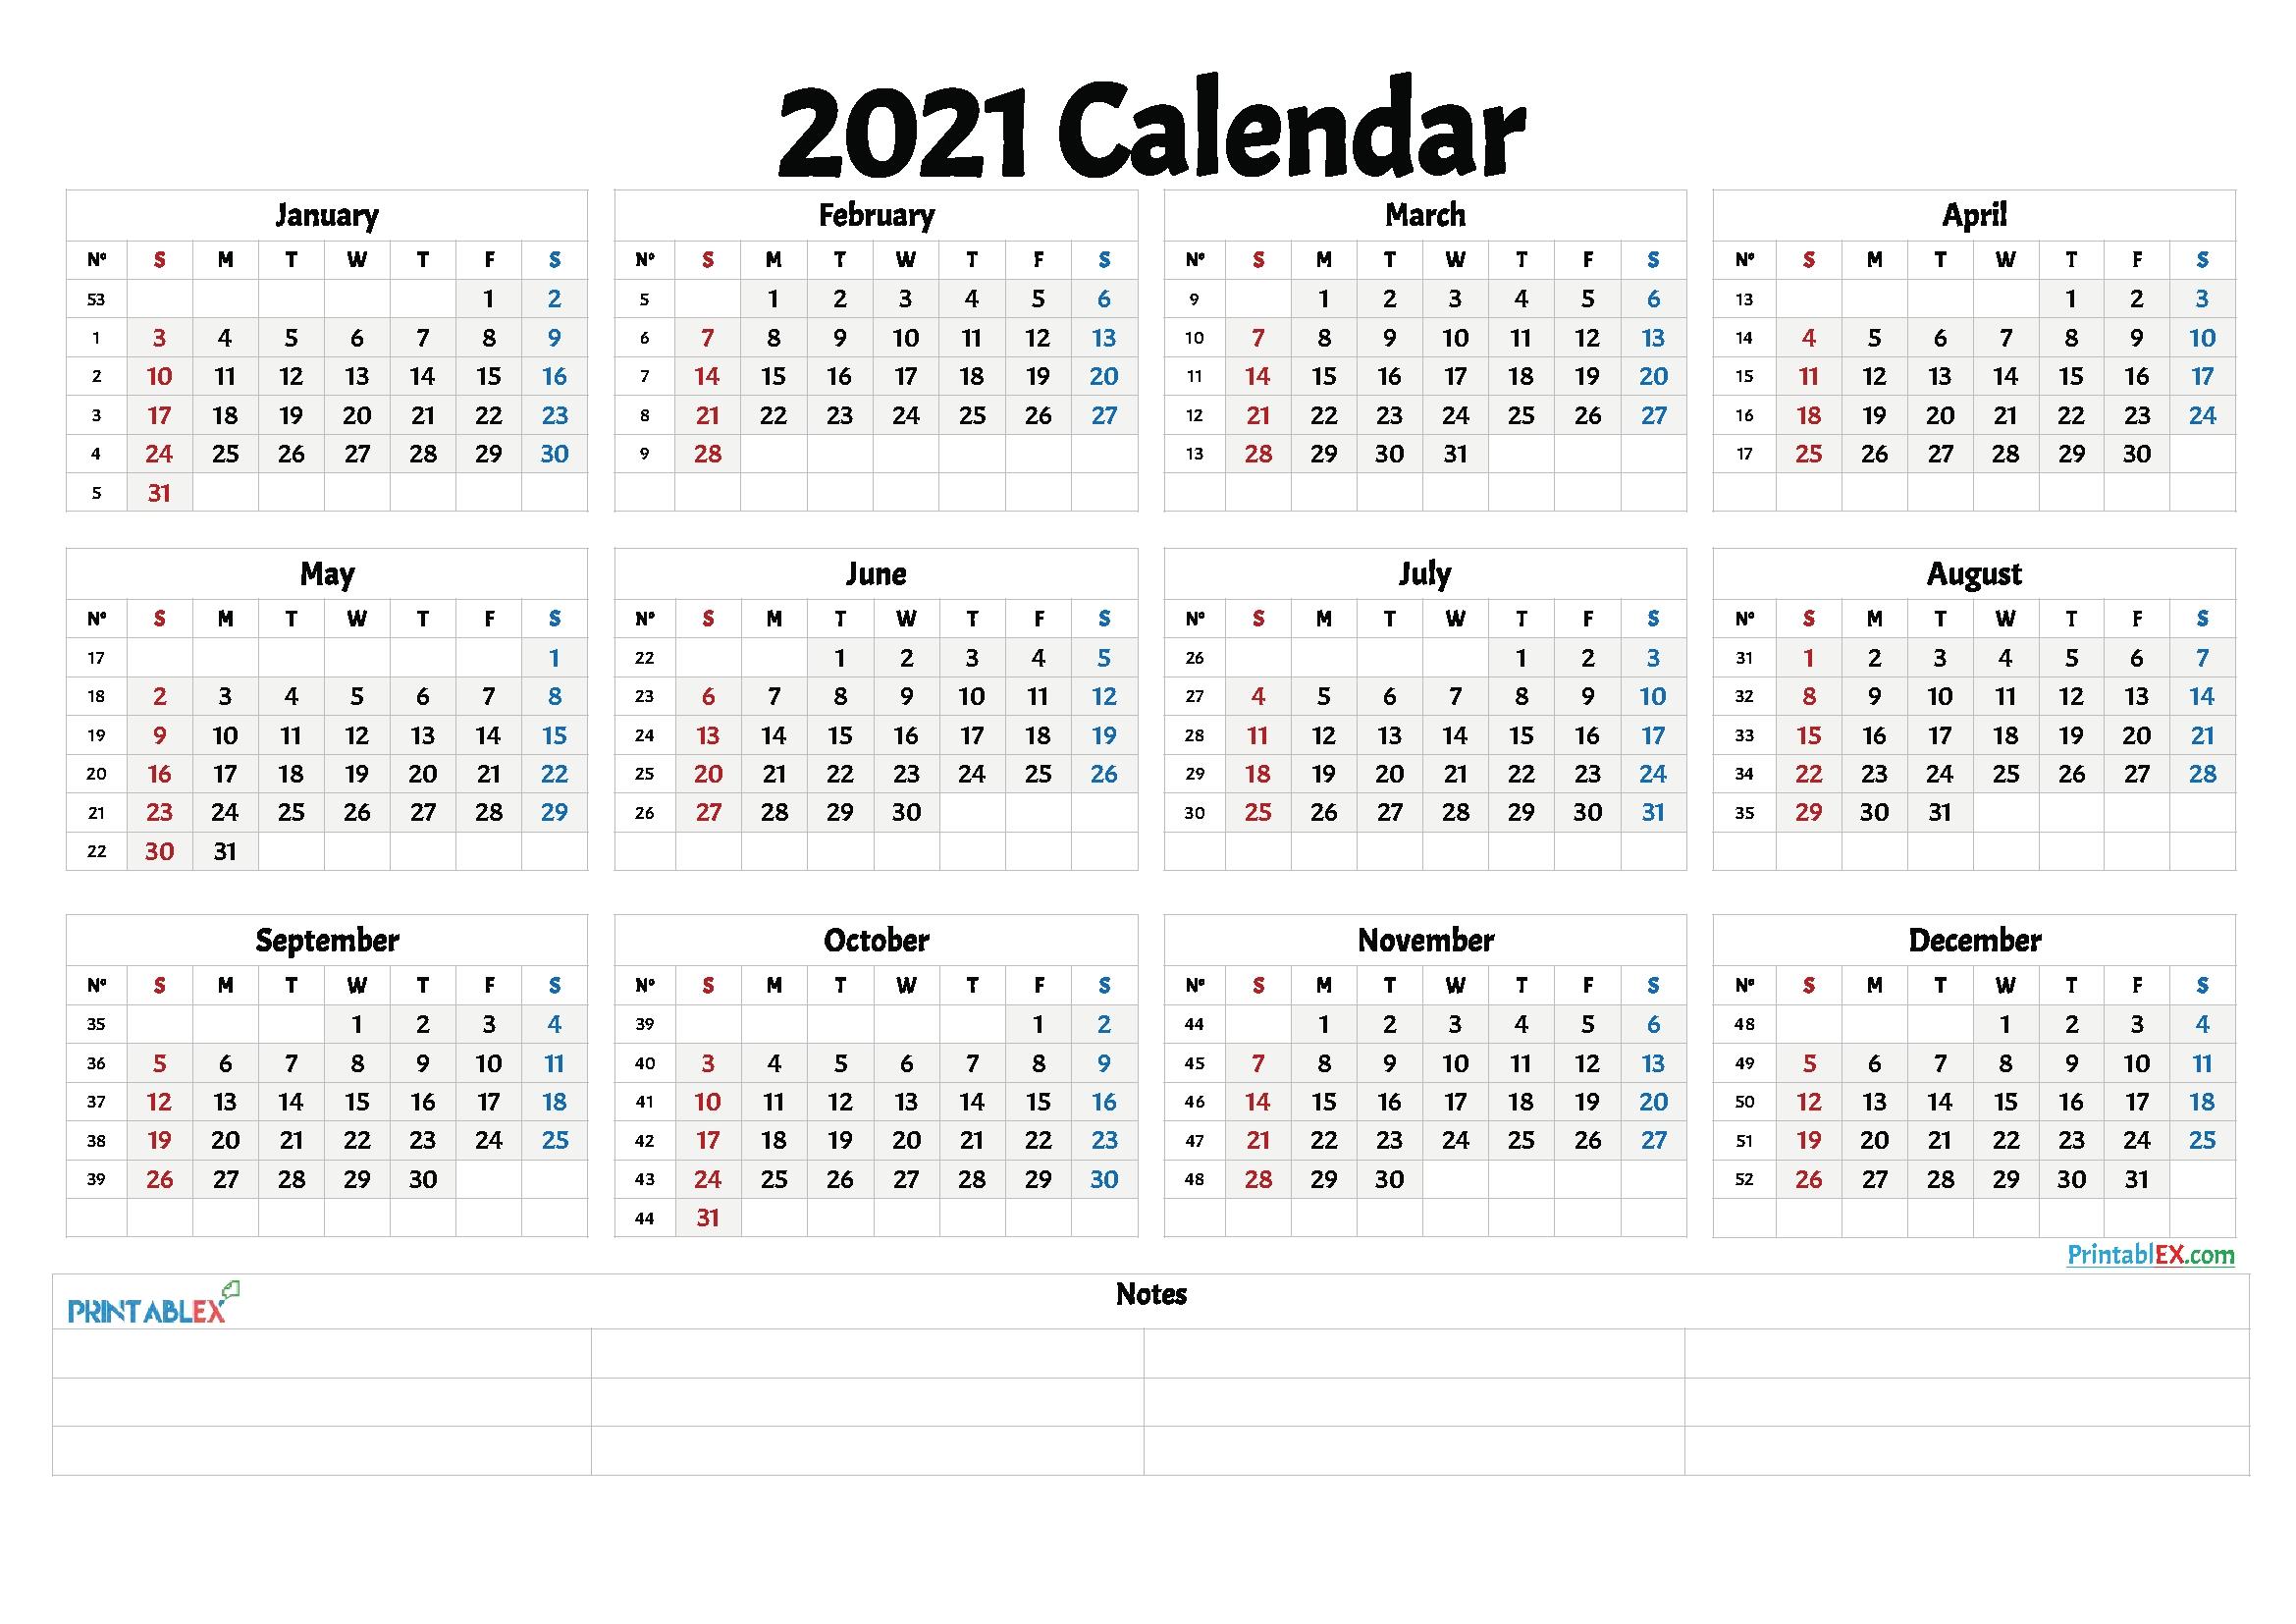 2021 Calendar Weeks Numbered - Template Calendar Design  Free 2021 Liturgical Calendar Umc